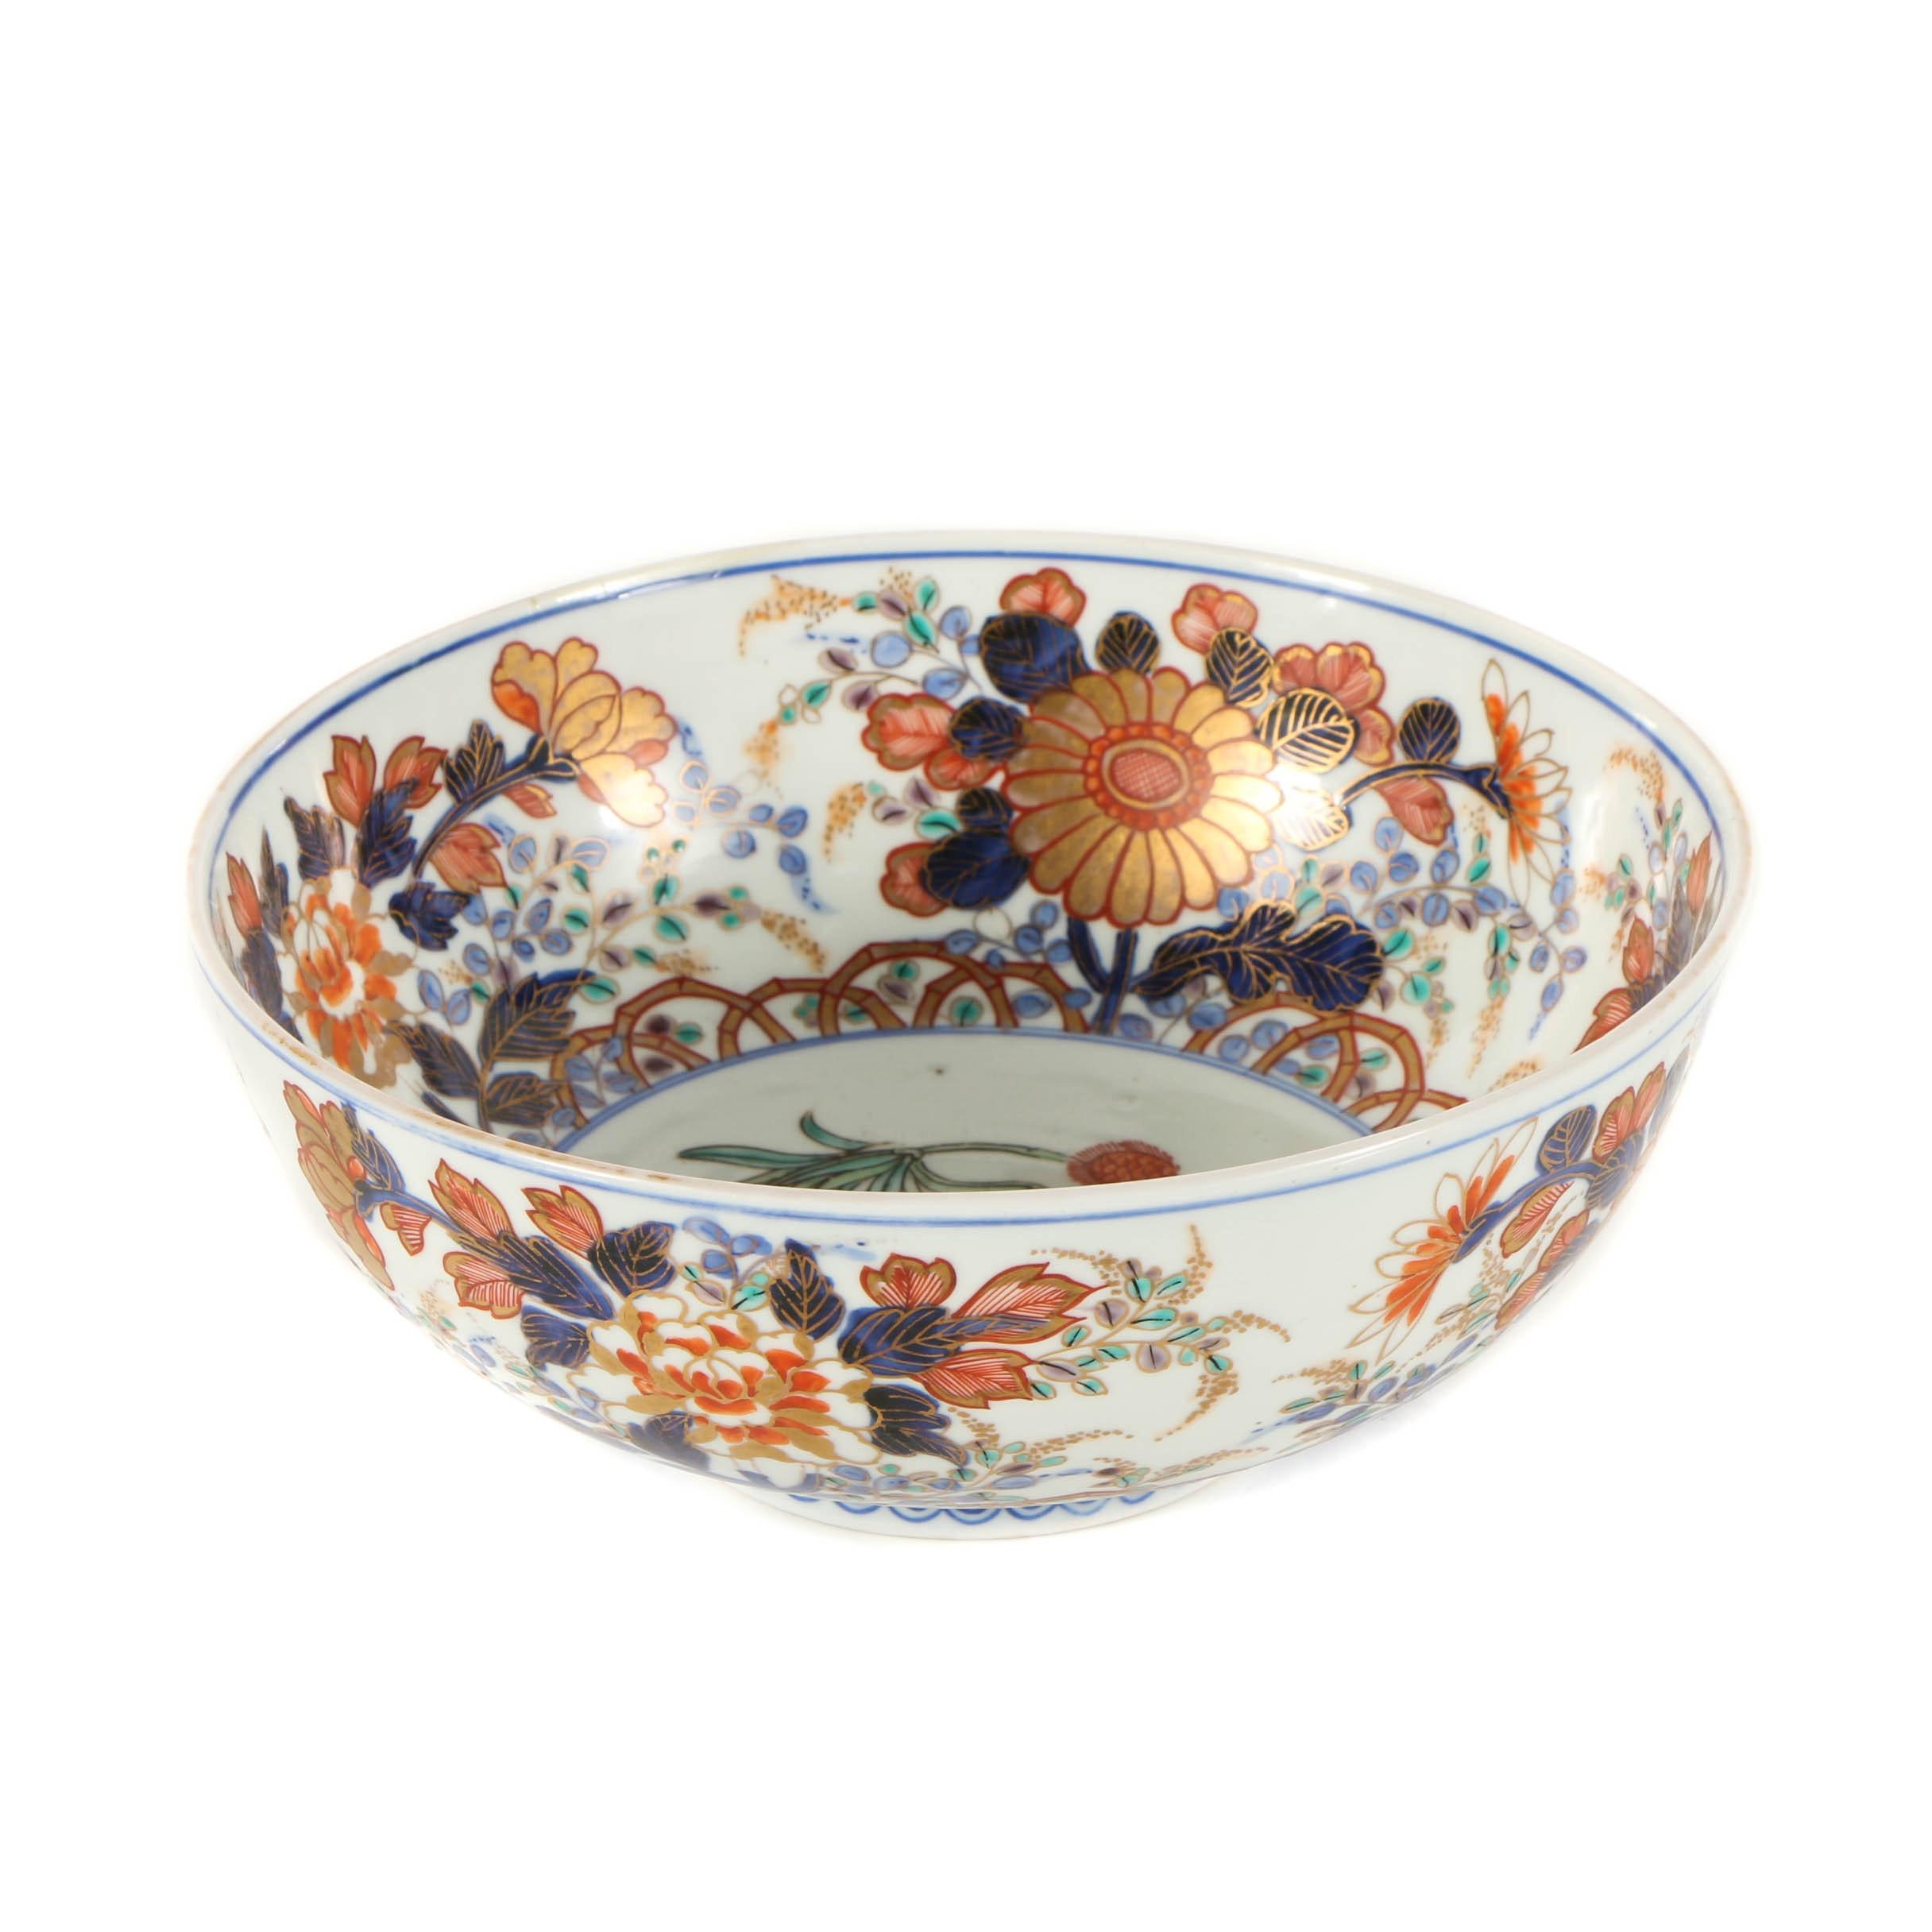 Japanese Porcelain Bowl with Floral Motif